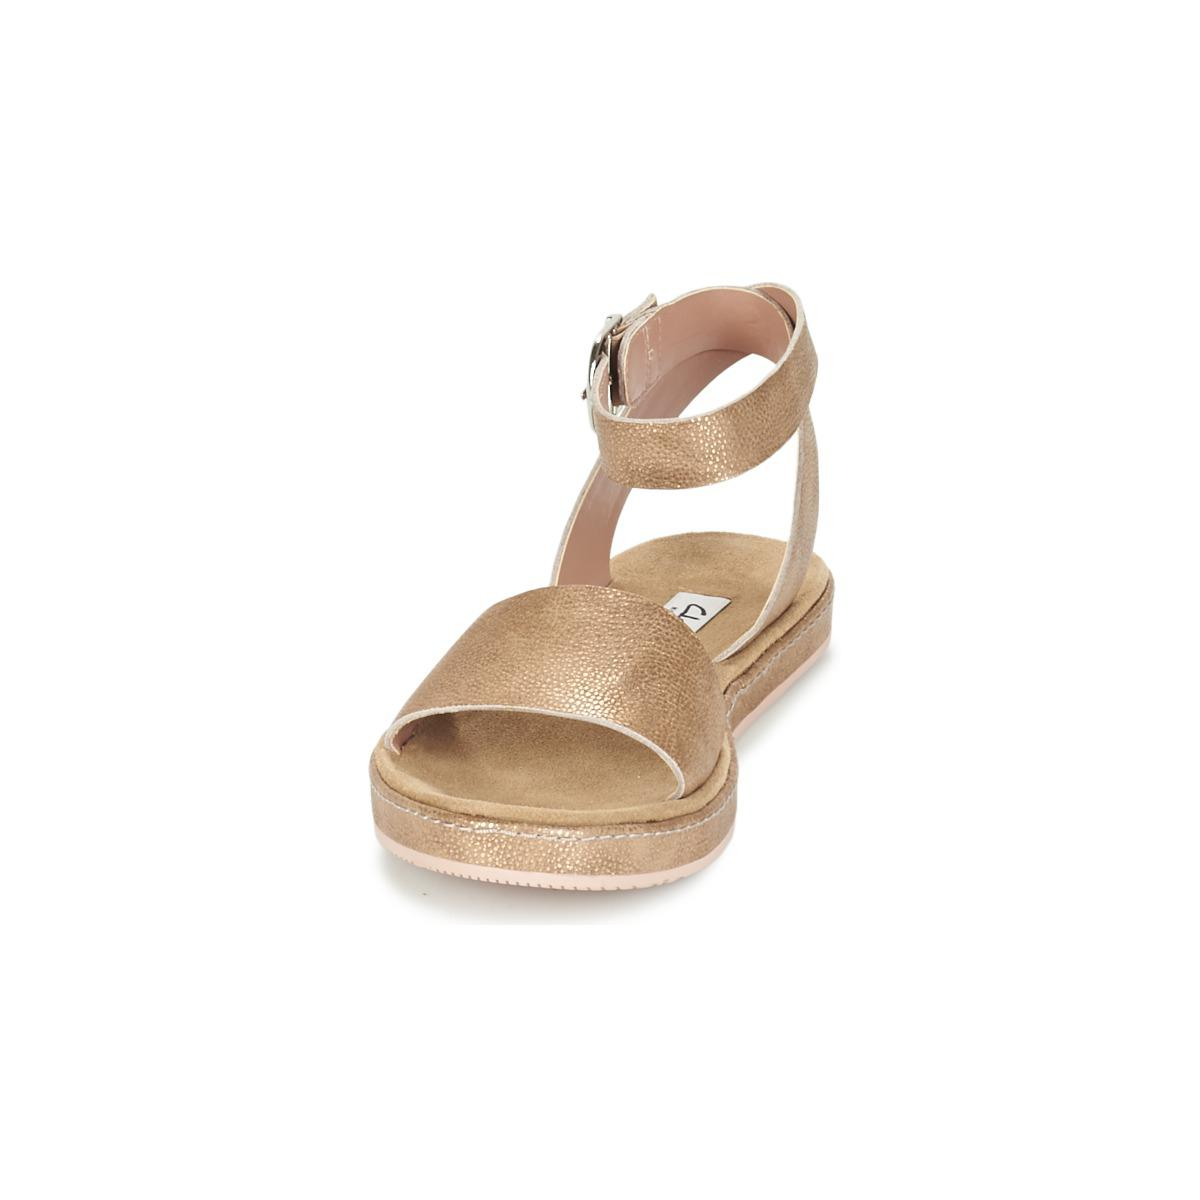 6641a8c33 Clarks Romantic Moon Women s Sandals In Gold in Metallic - Lyst